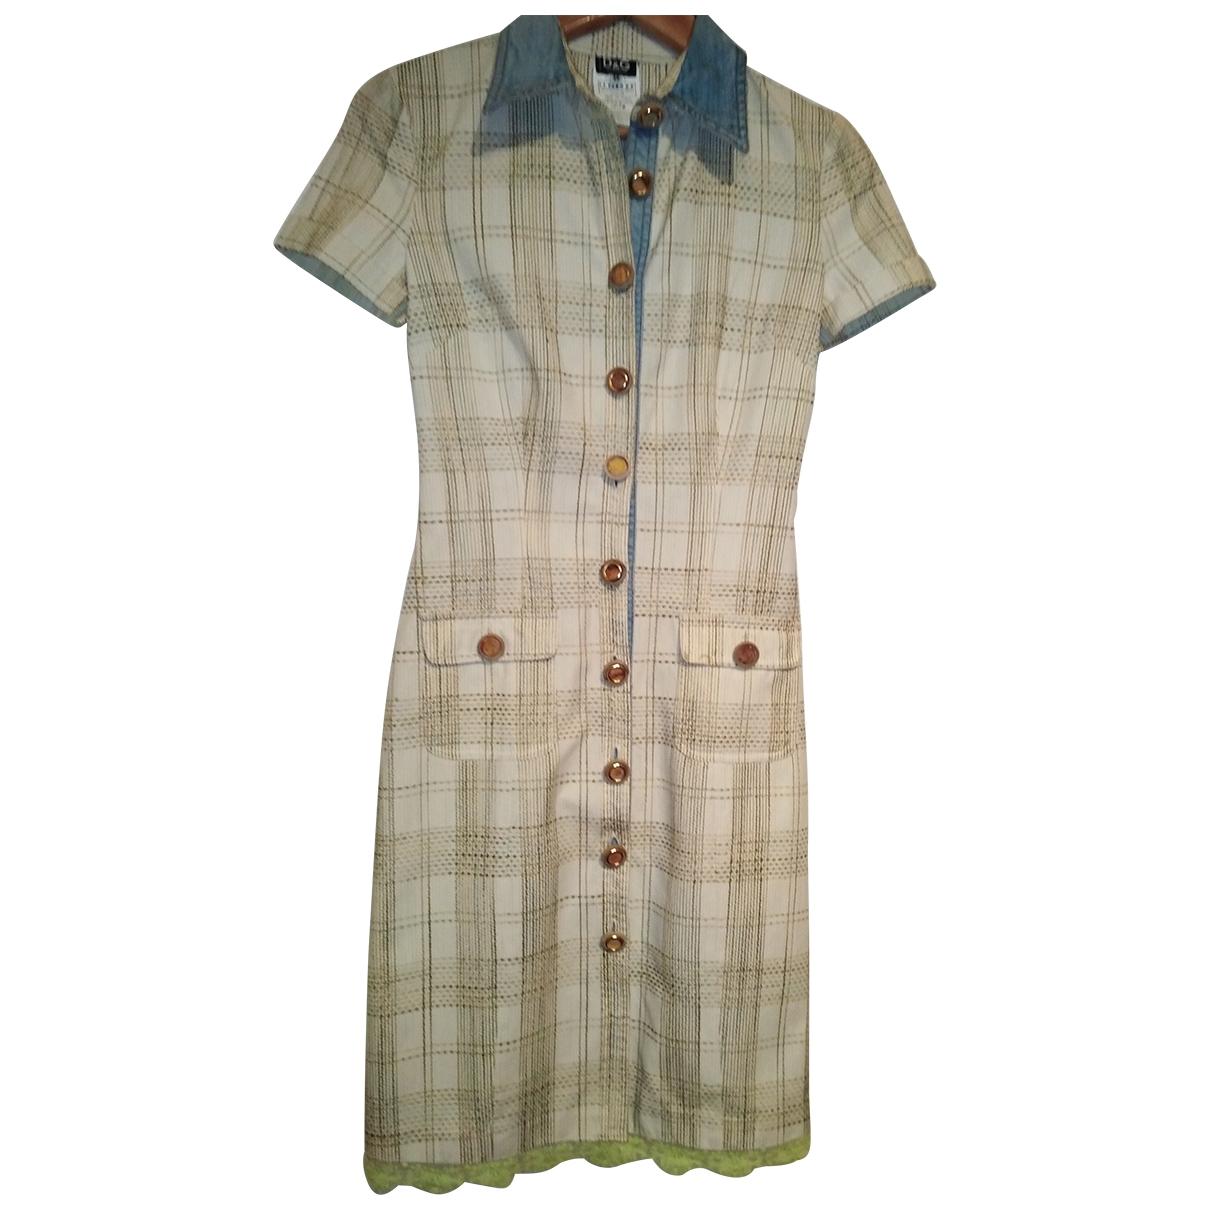 D&g \N Kleid in  Gruen Baumwolle